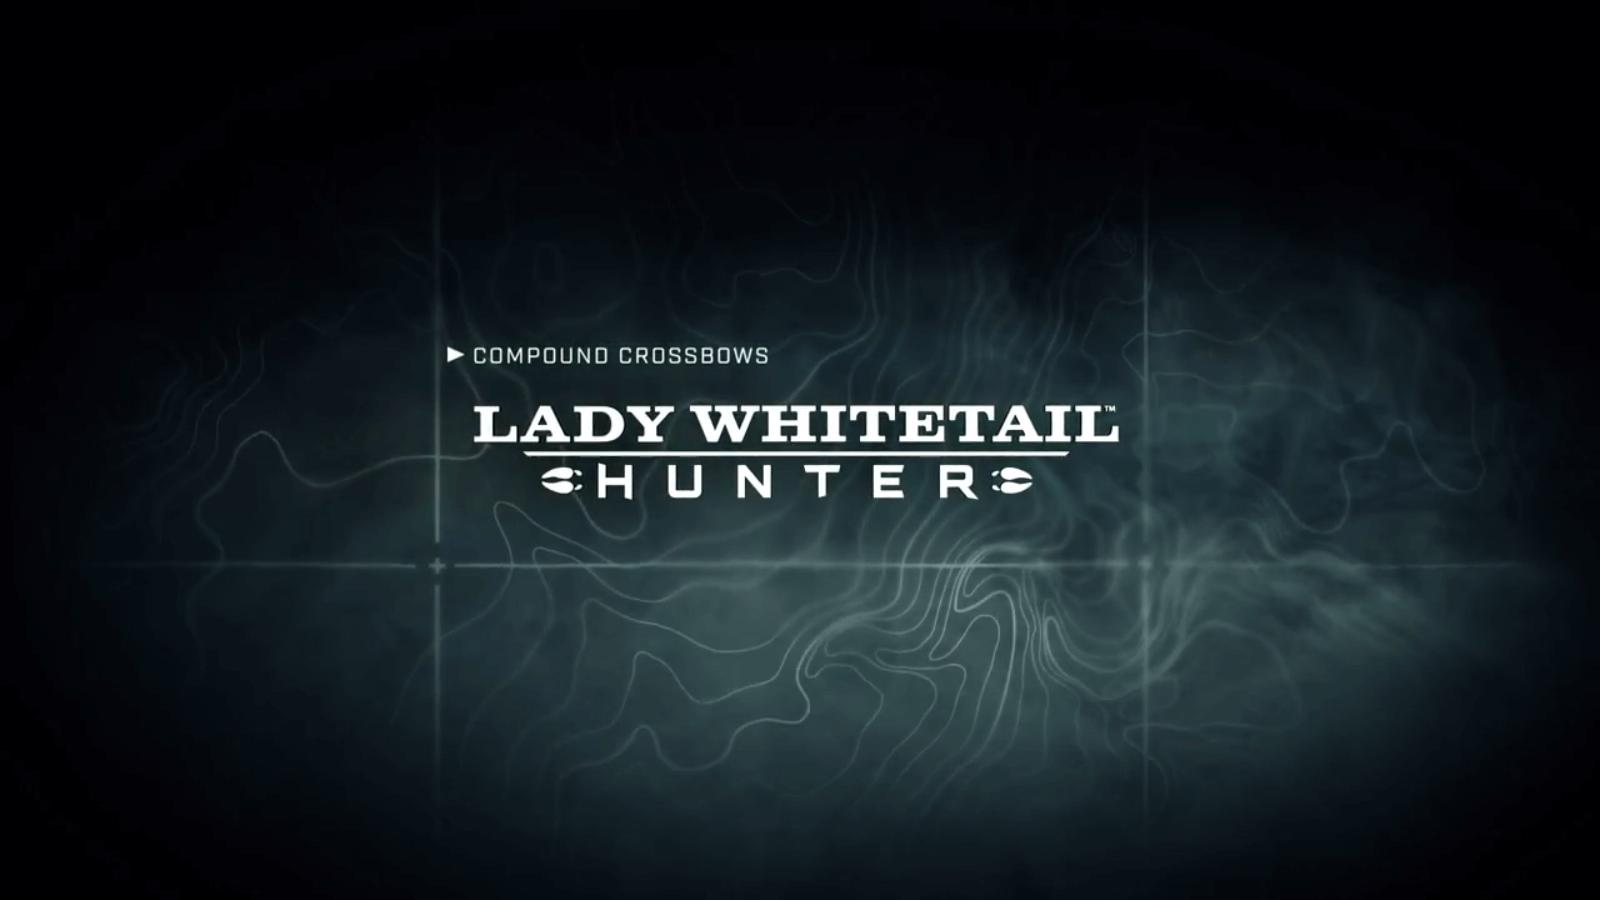 Lady Whitetail Hunter